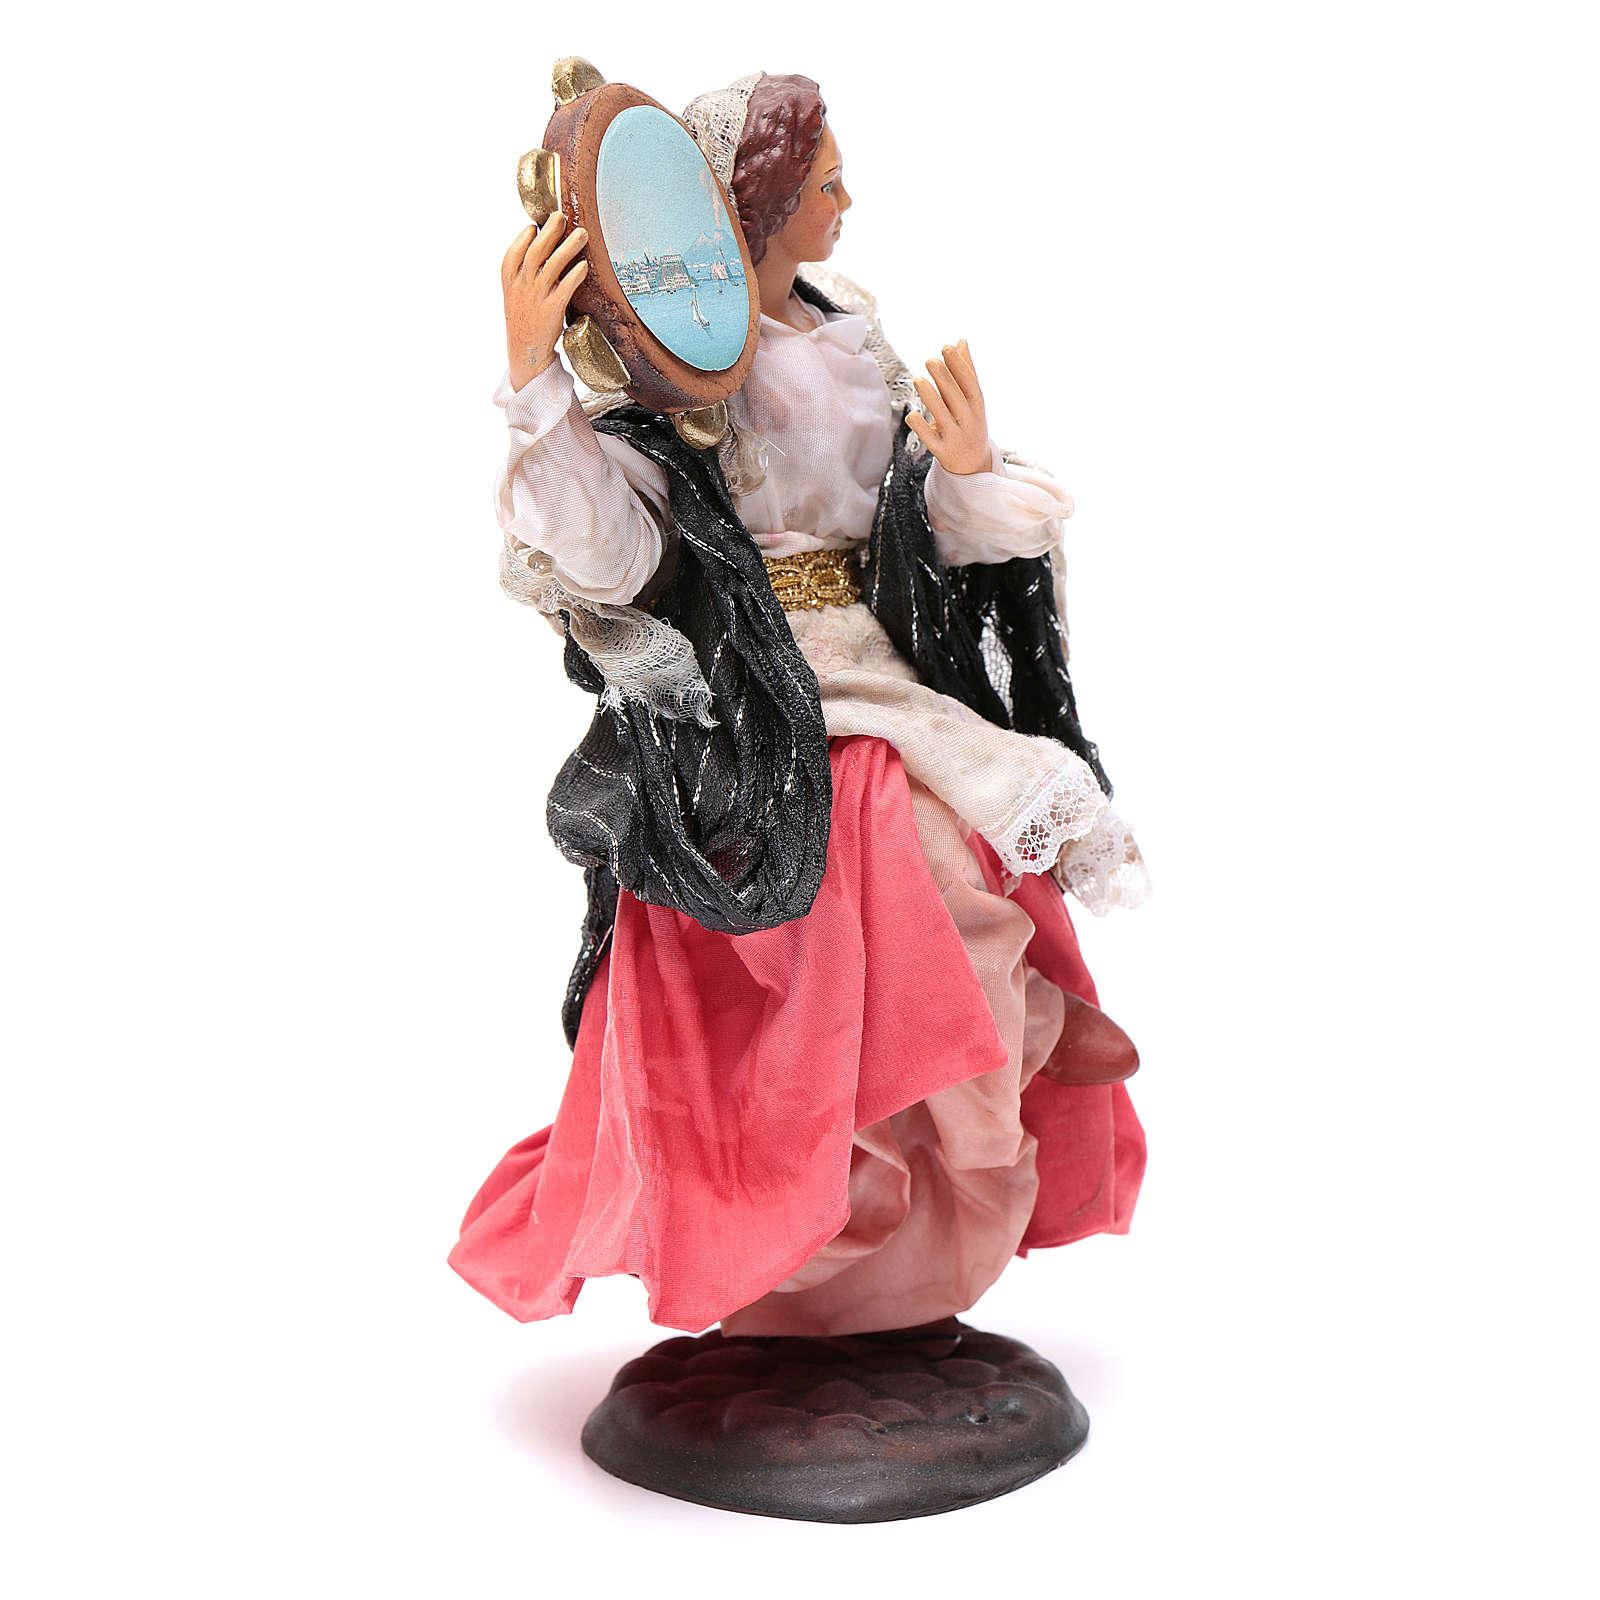 Neapolitan nativity figurine, woman with tambourine 18cm 4